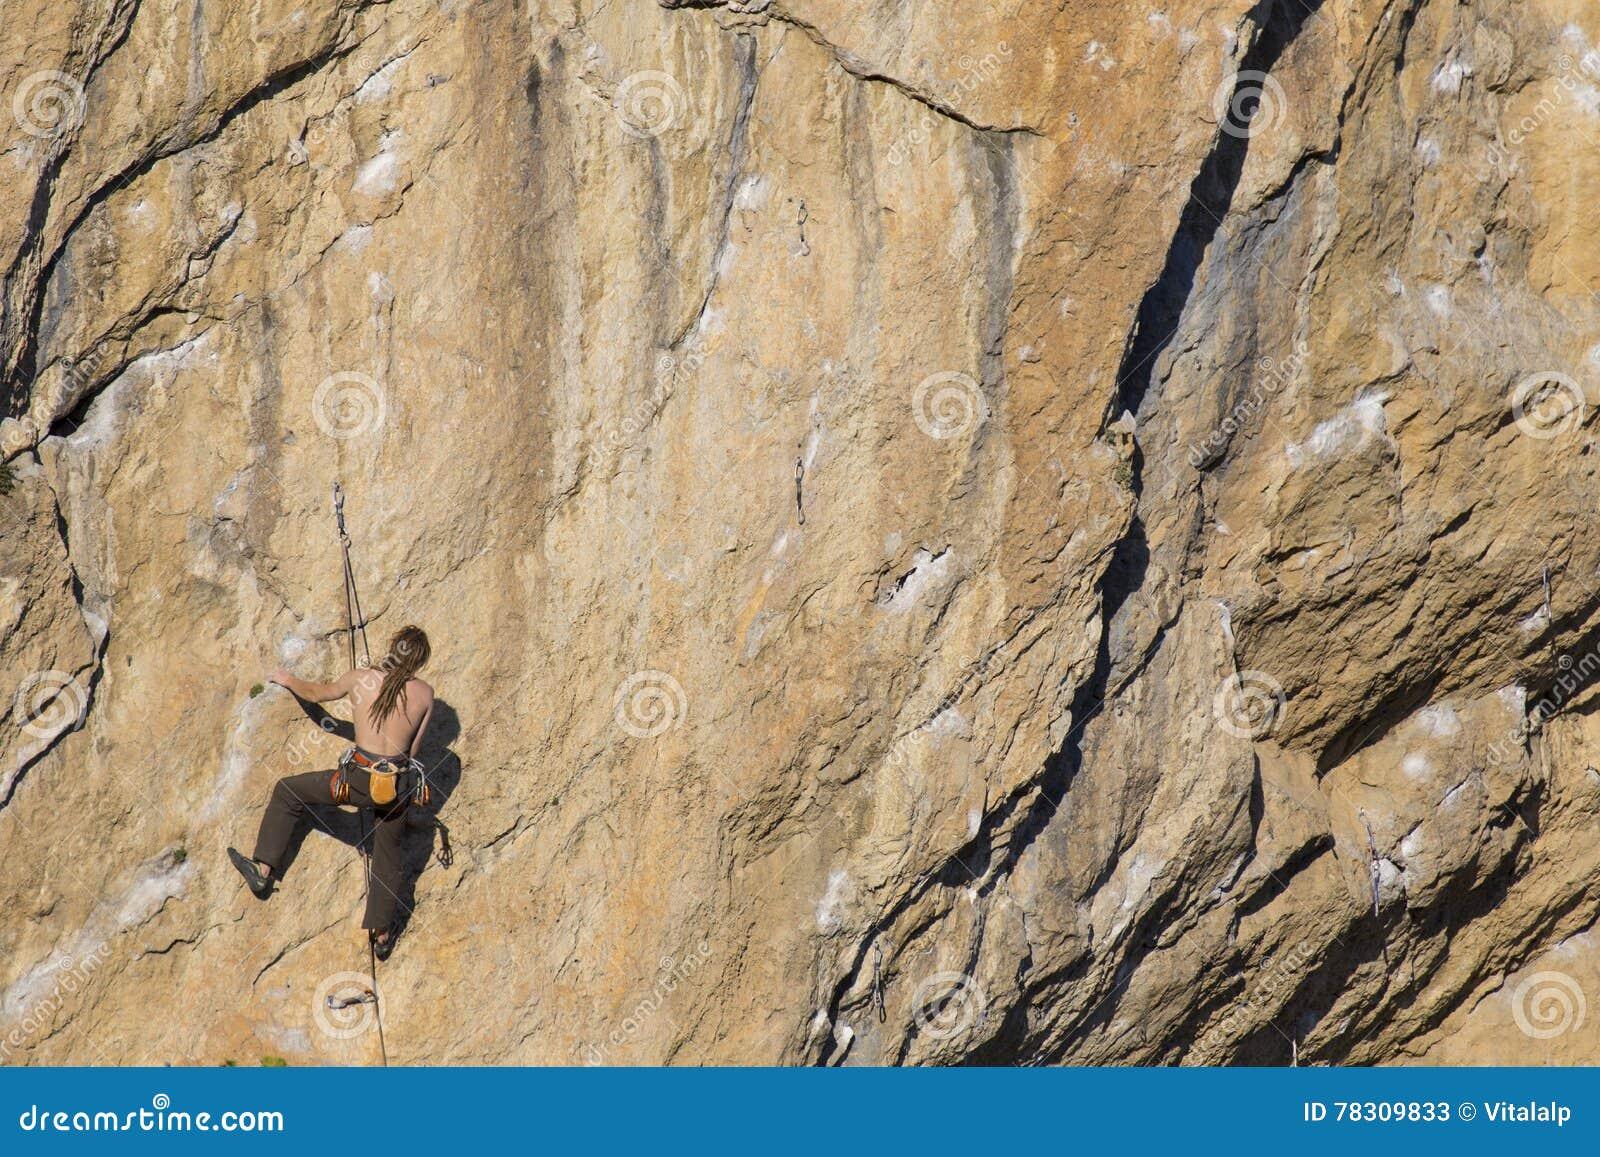 Cliffhanger Stock Image Image Of Rappel Motivational